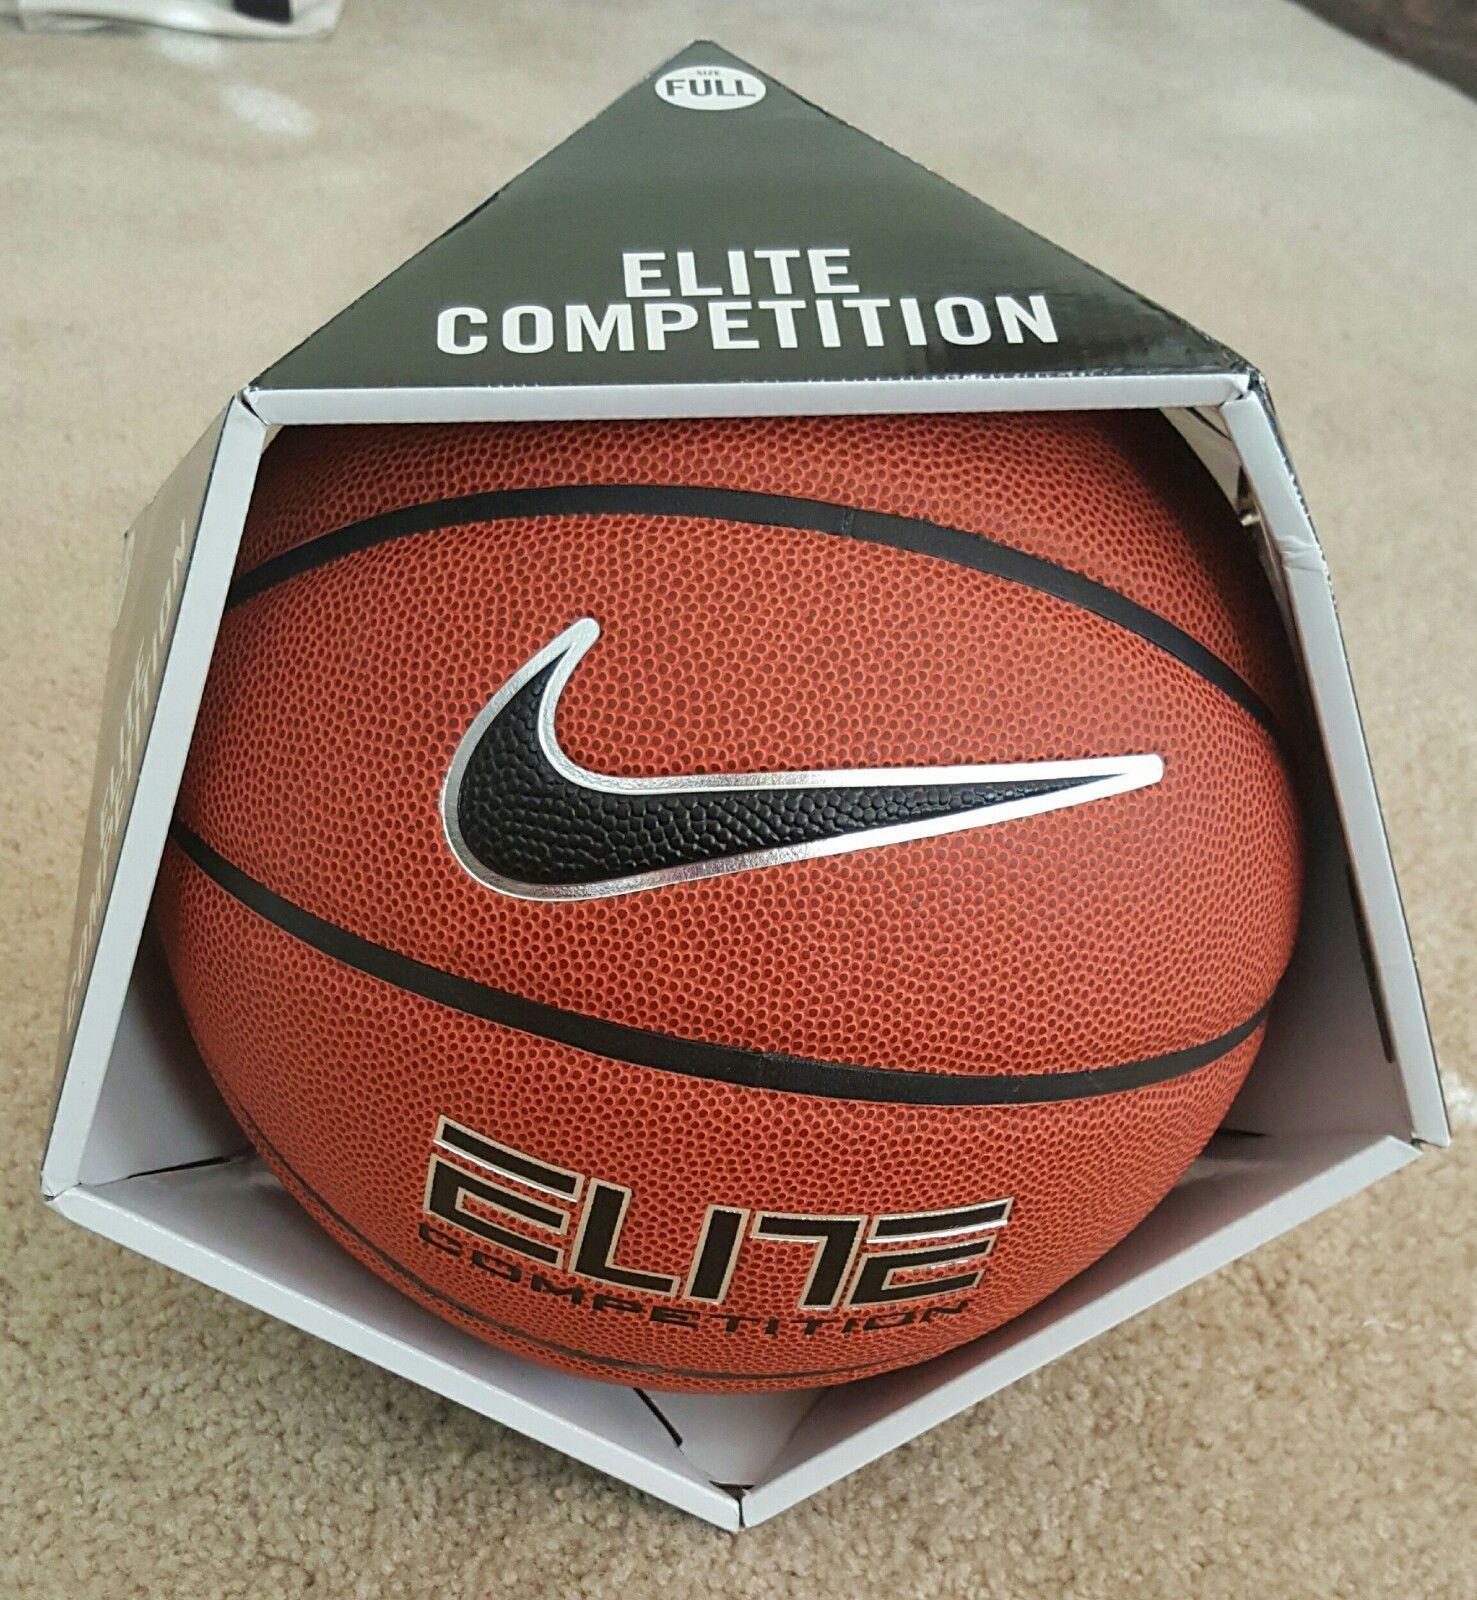 34b6aada2 nike elite competition 8-panel size 7 basketball ball | Common Shopping